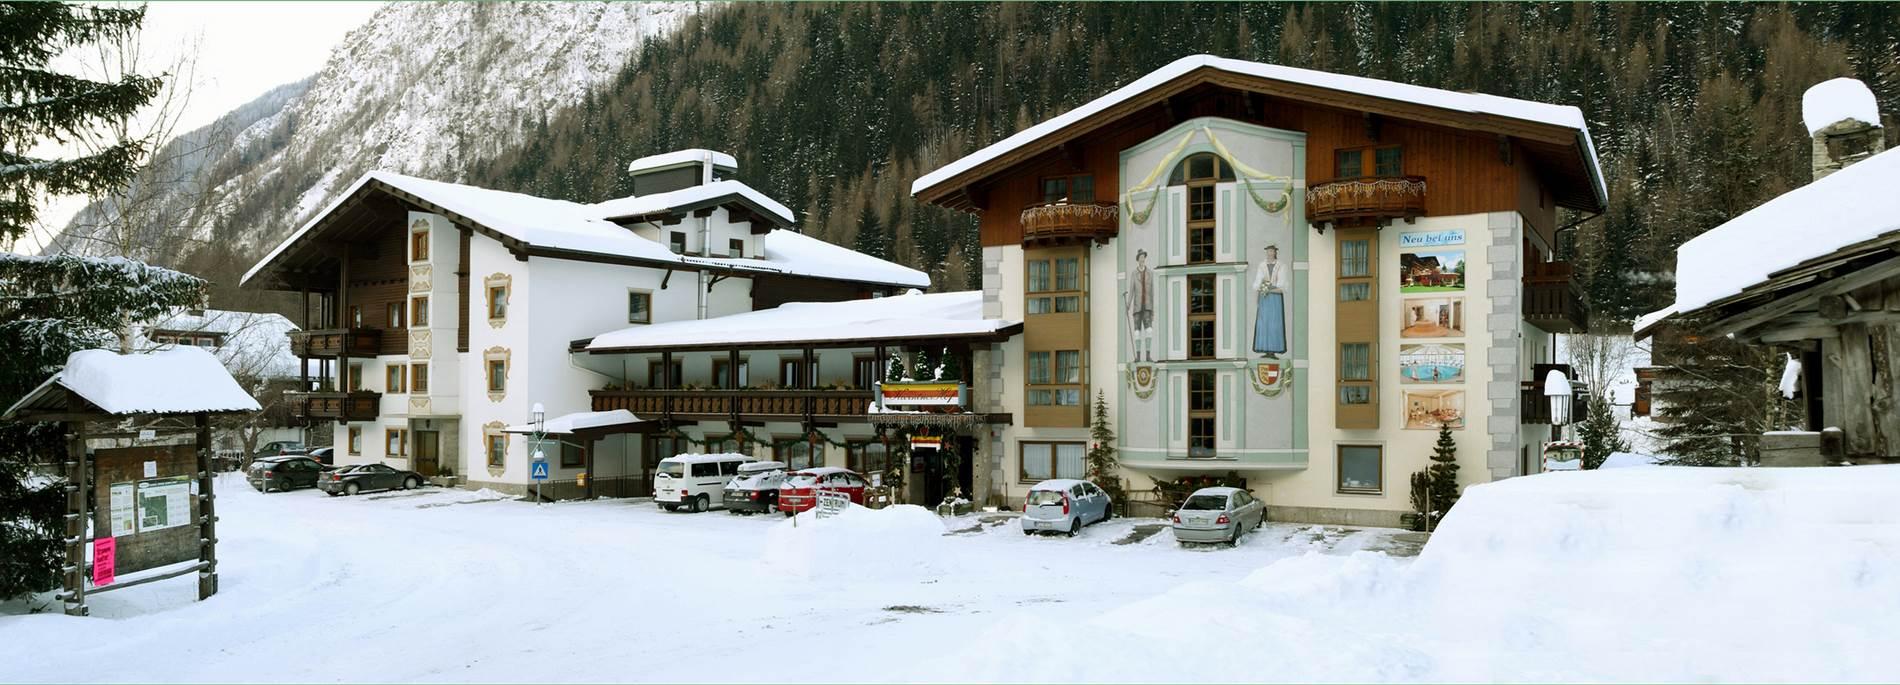 Hotel-Kaerntnerhof_Winter_a.jpg_3dak139_1900xX